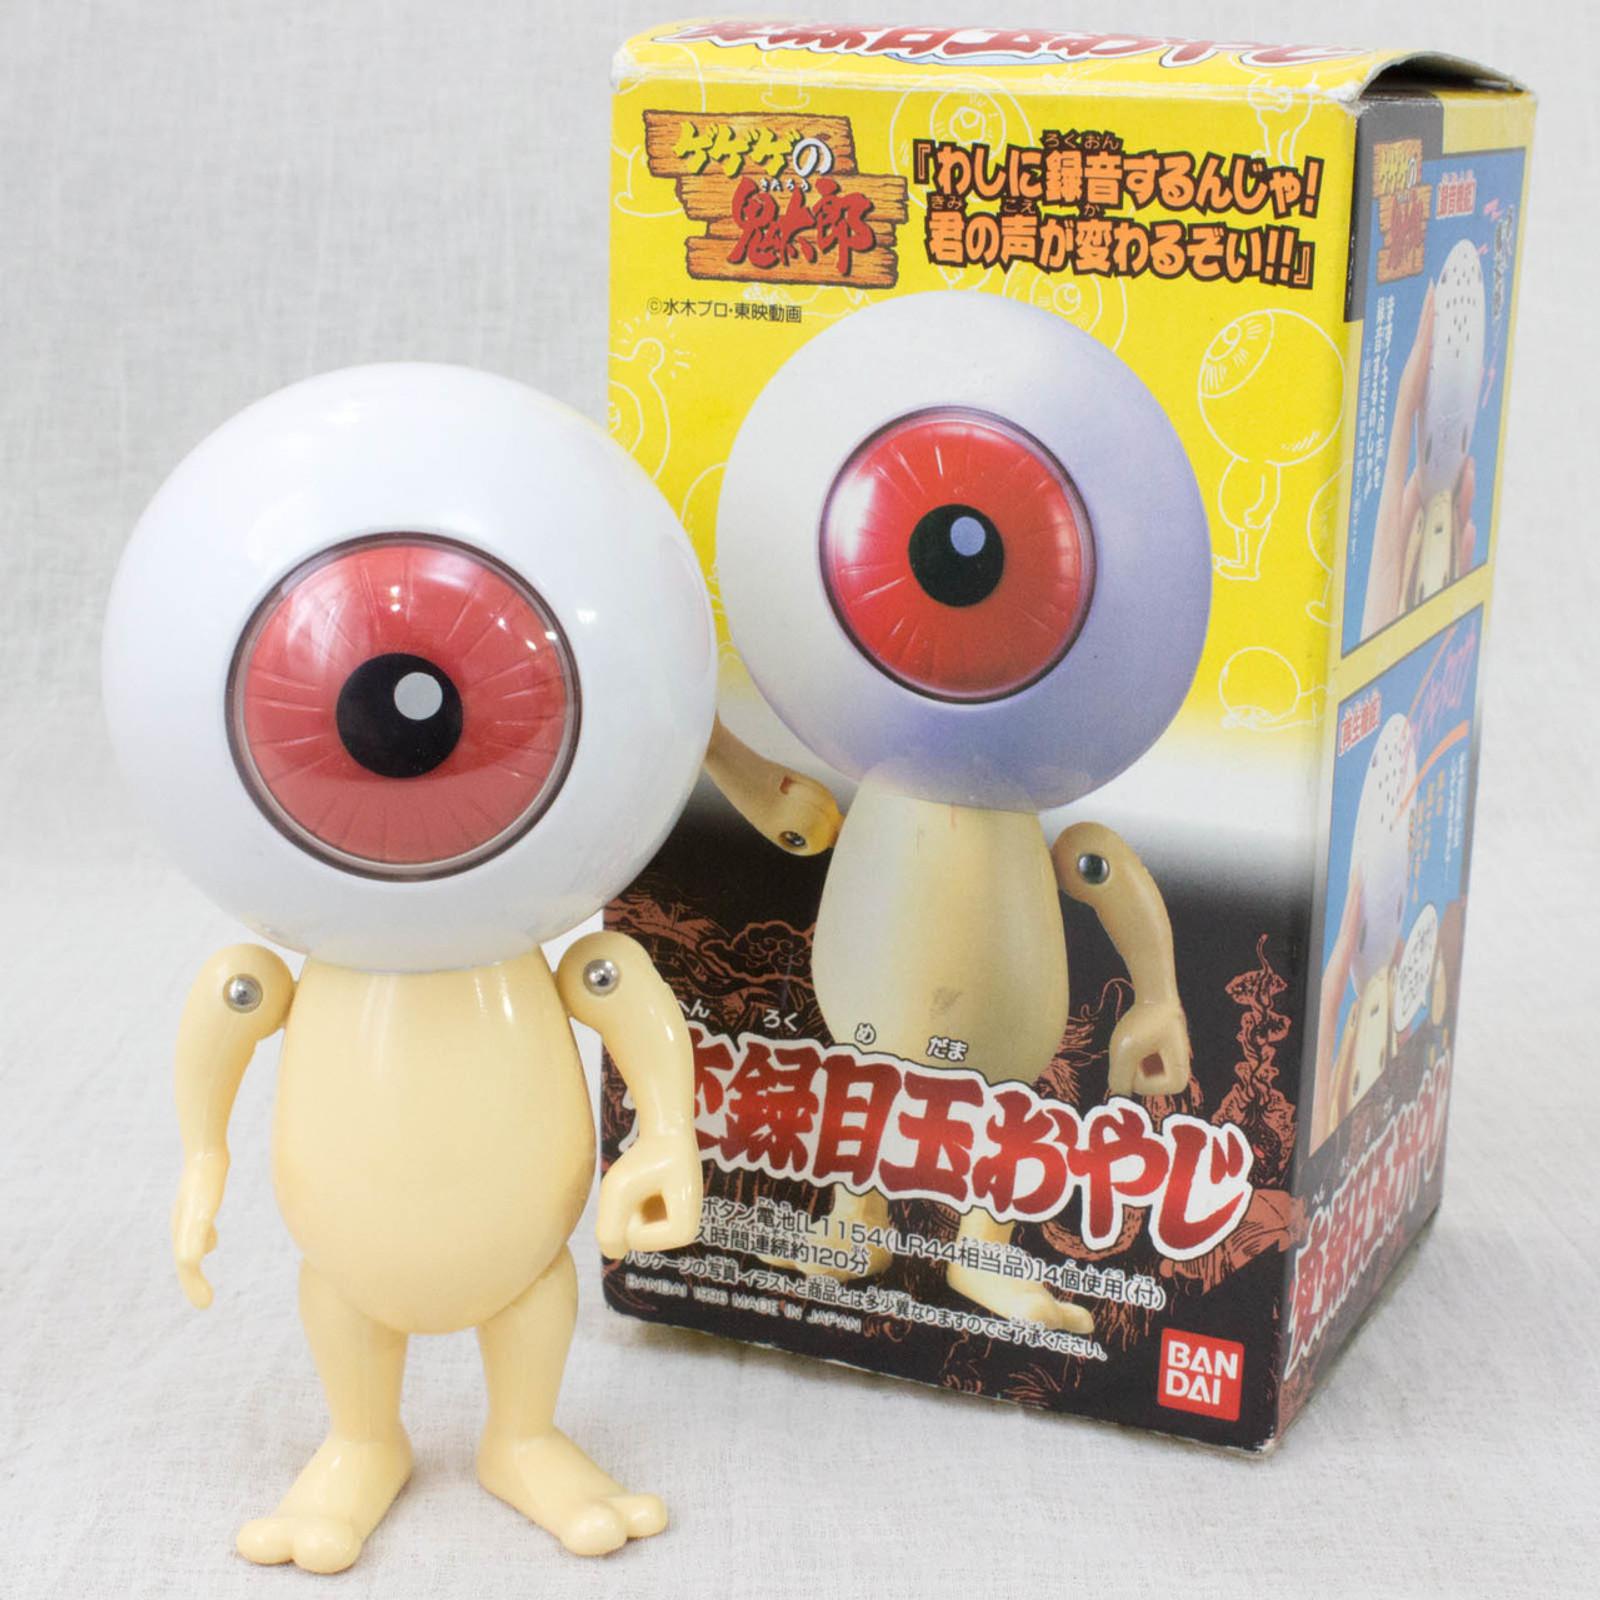 GeGeGe no Kitaro Medama Oyaji Voice Recorder Figure Bandai JAPAN ANIME